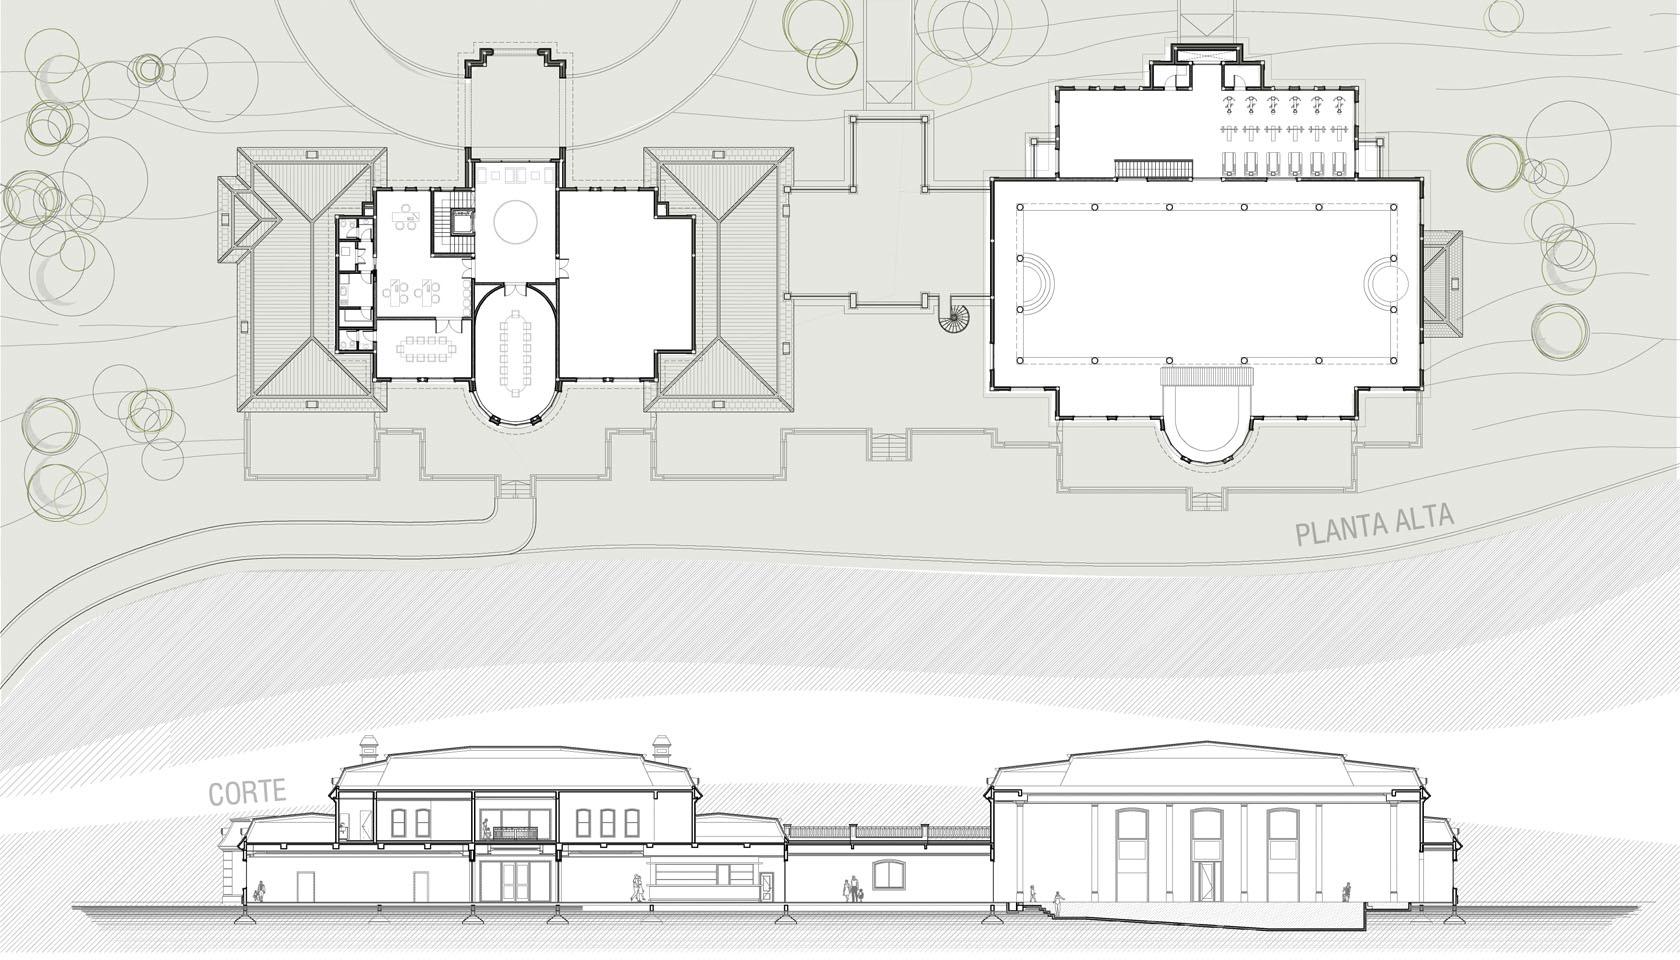 Arquitectura neoclásica francesa, diseño de grandes edificios neoclásicos.